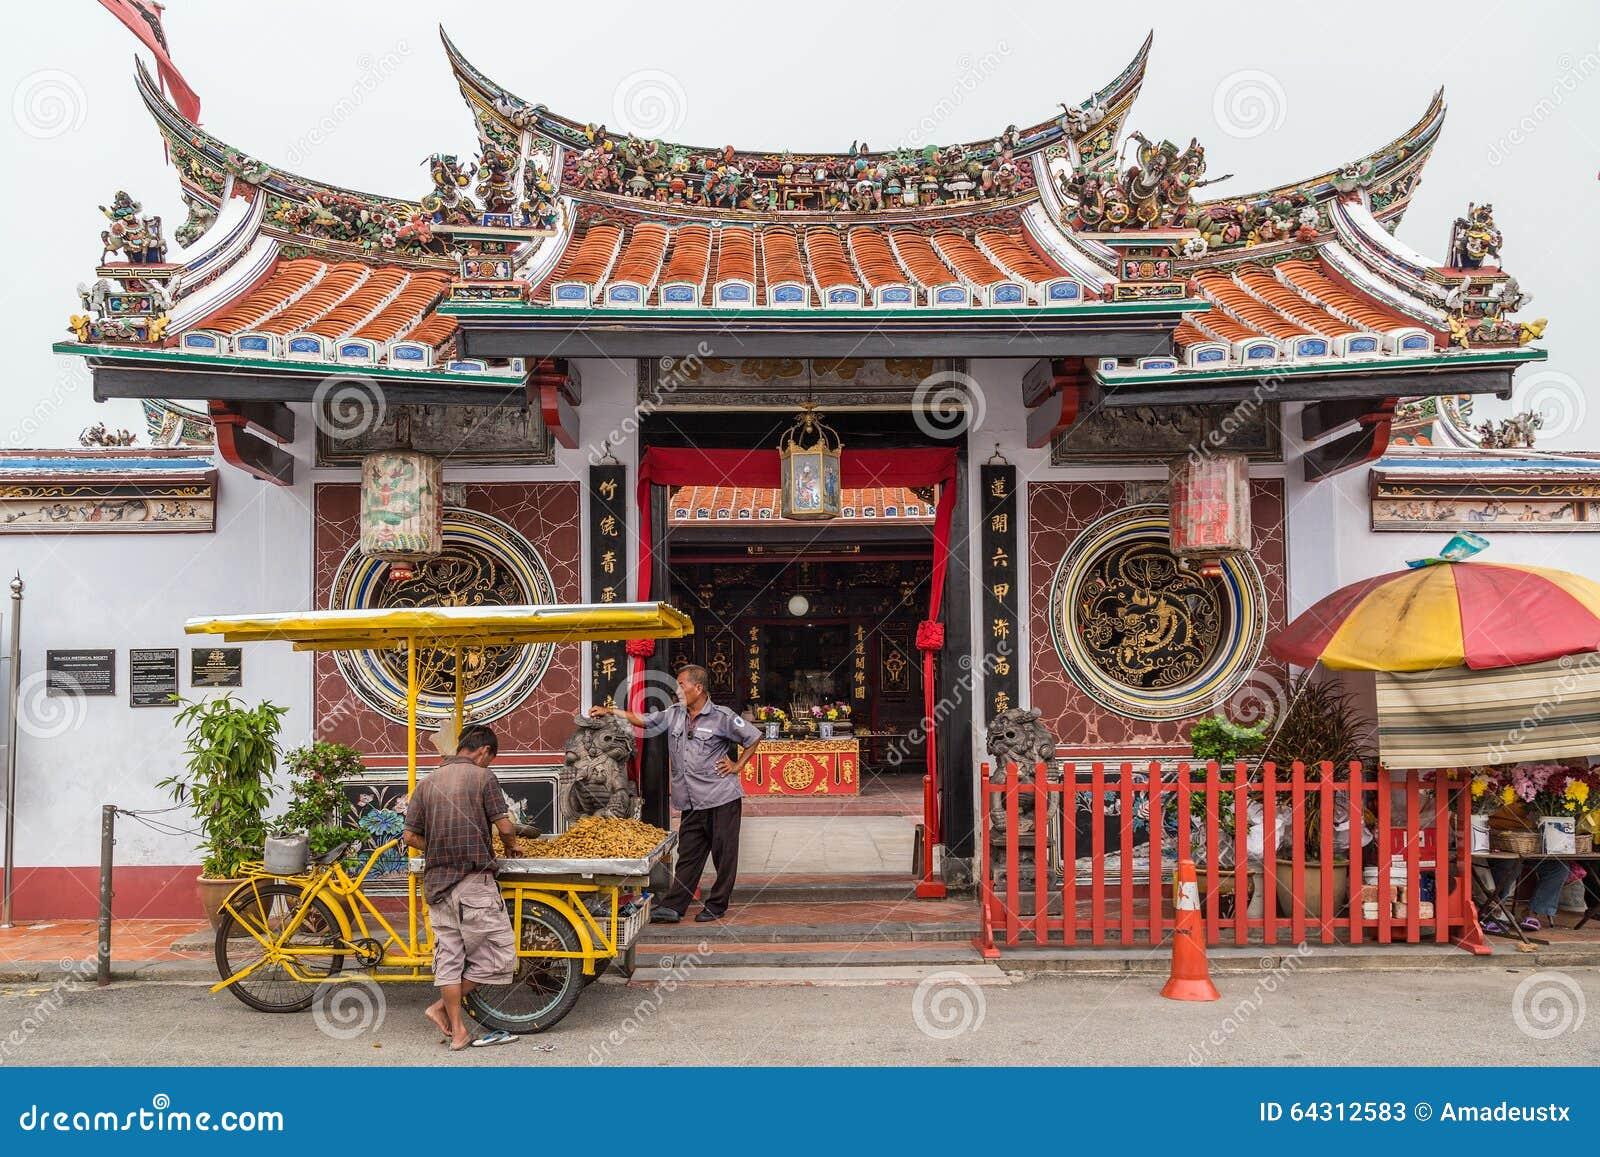 Georgetown, Penang/Malesia - circa ottobre 2015: Tempio buddista cinese di Cheng Hoon Teng a Georgetown, Penang, Malesia